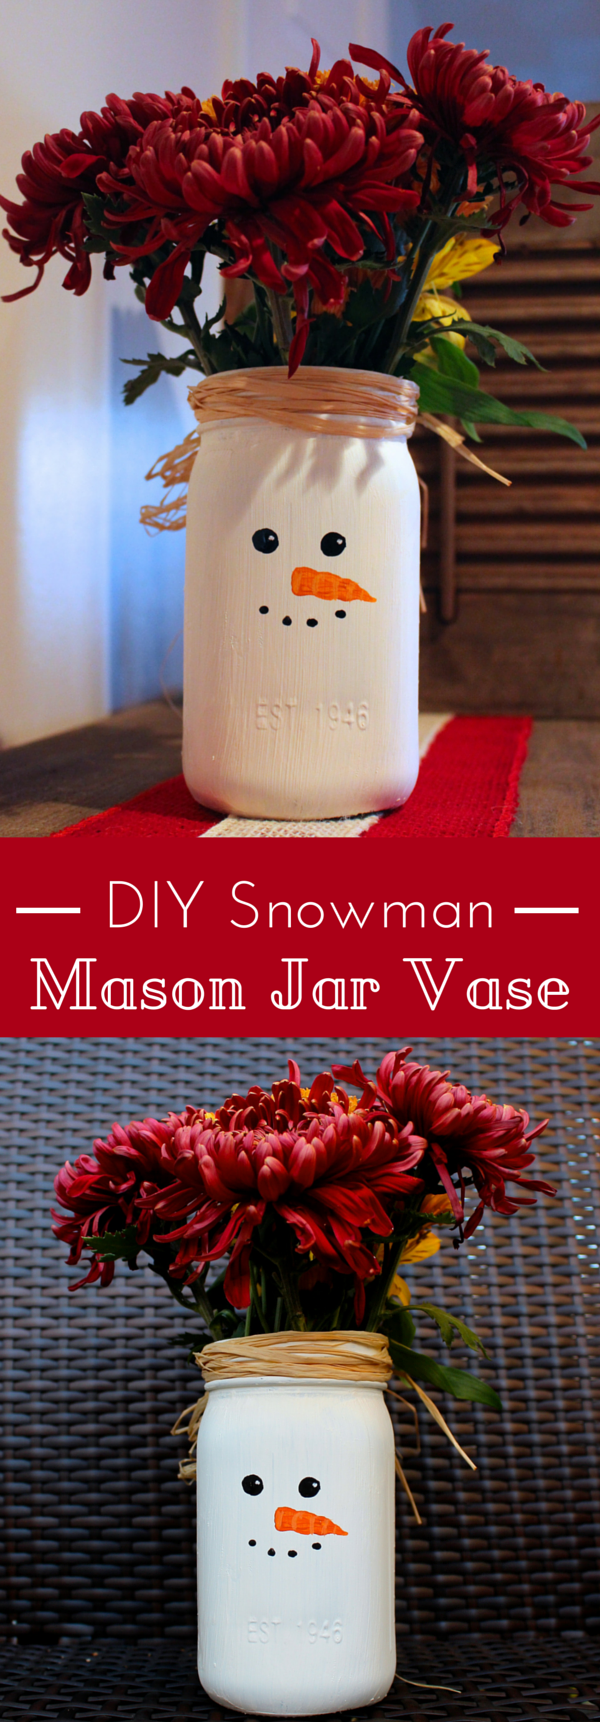 Simple DIY Snowman Mason Jar Vase